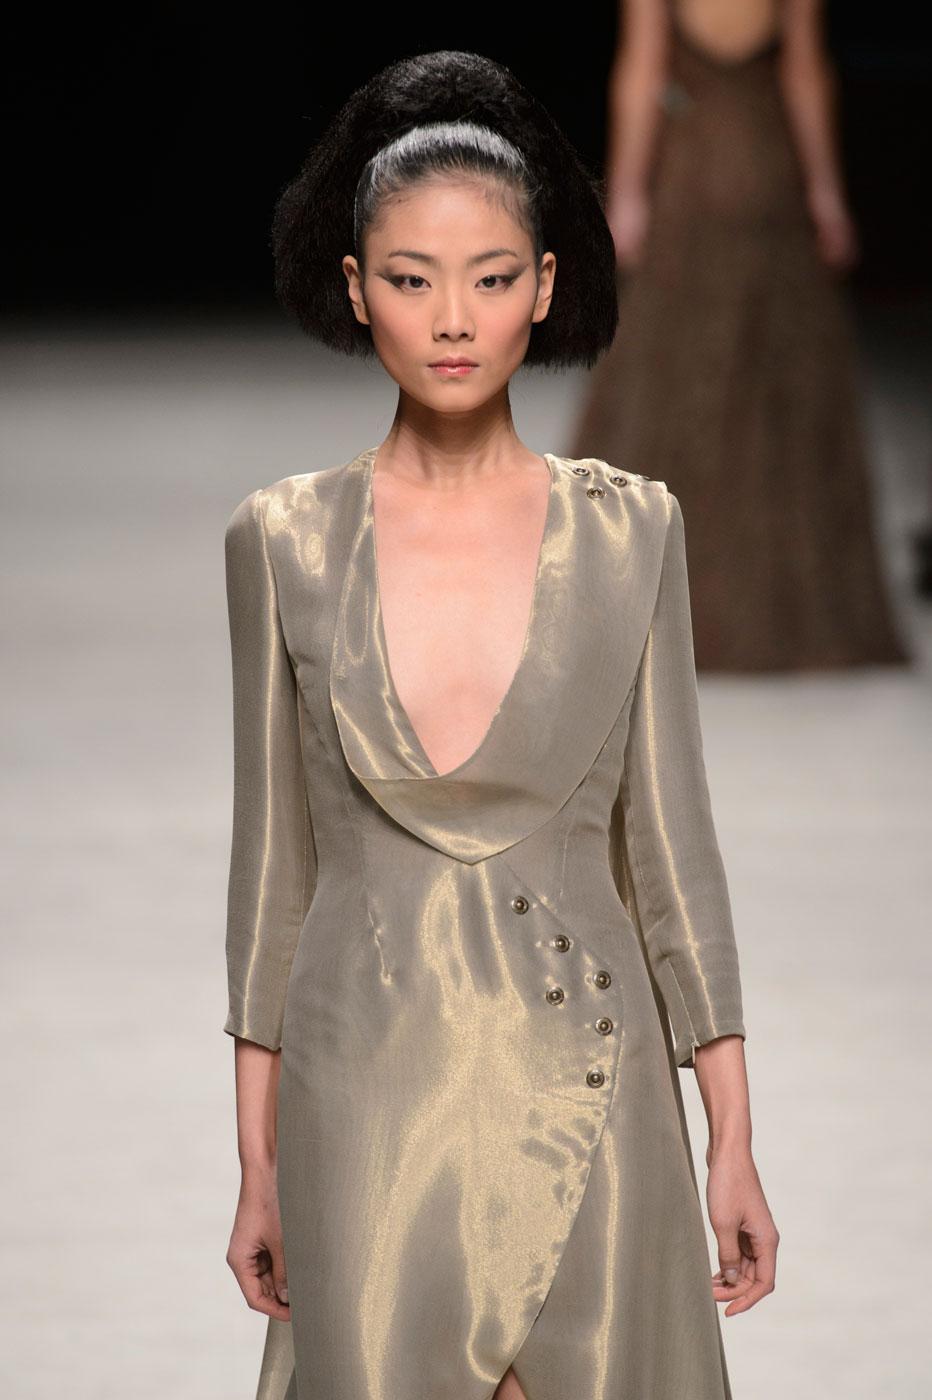 Julien-Fournie-Prive-fashion-runway-show-haute-couture-paris-spring-2015-the-impression-43